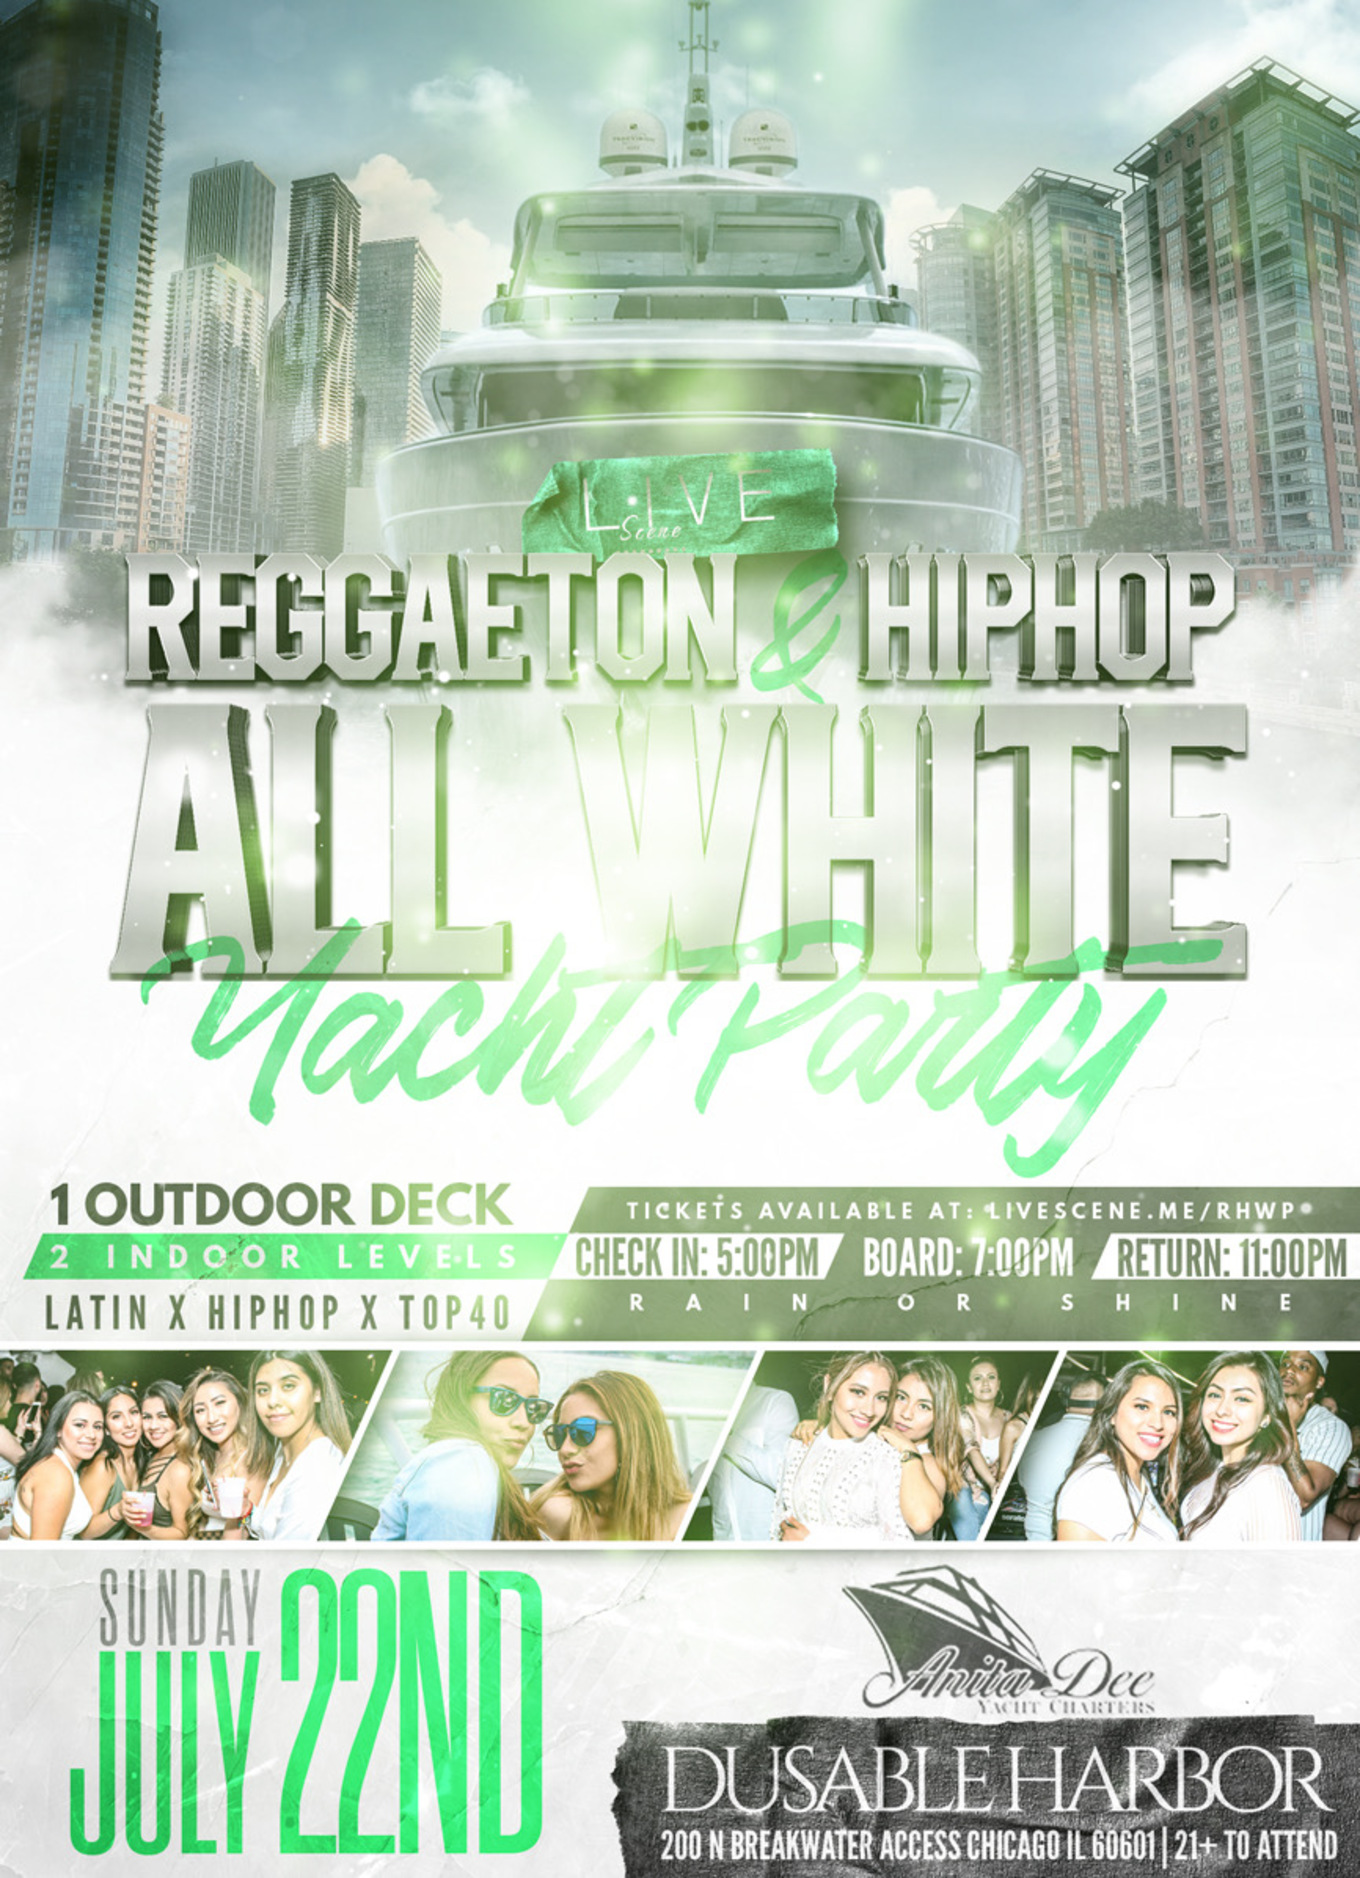 Reggaeton & HipHop White Yacht Party - Tickets - Anita Dee